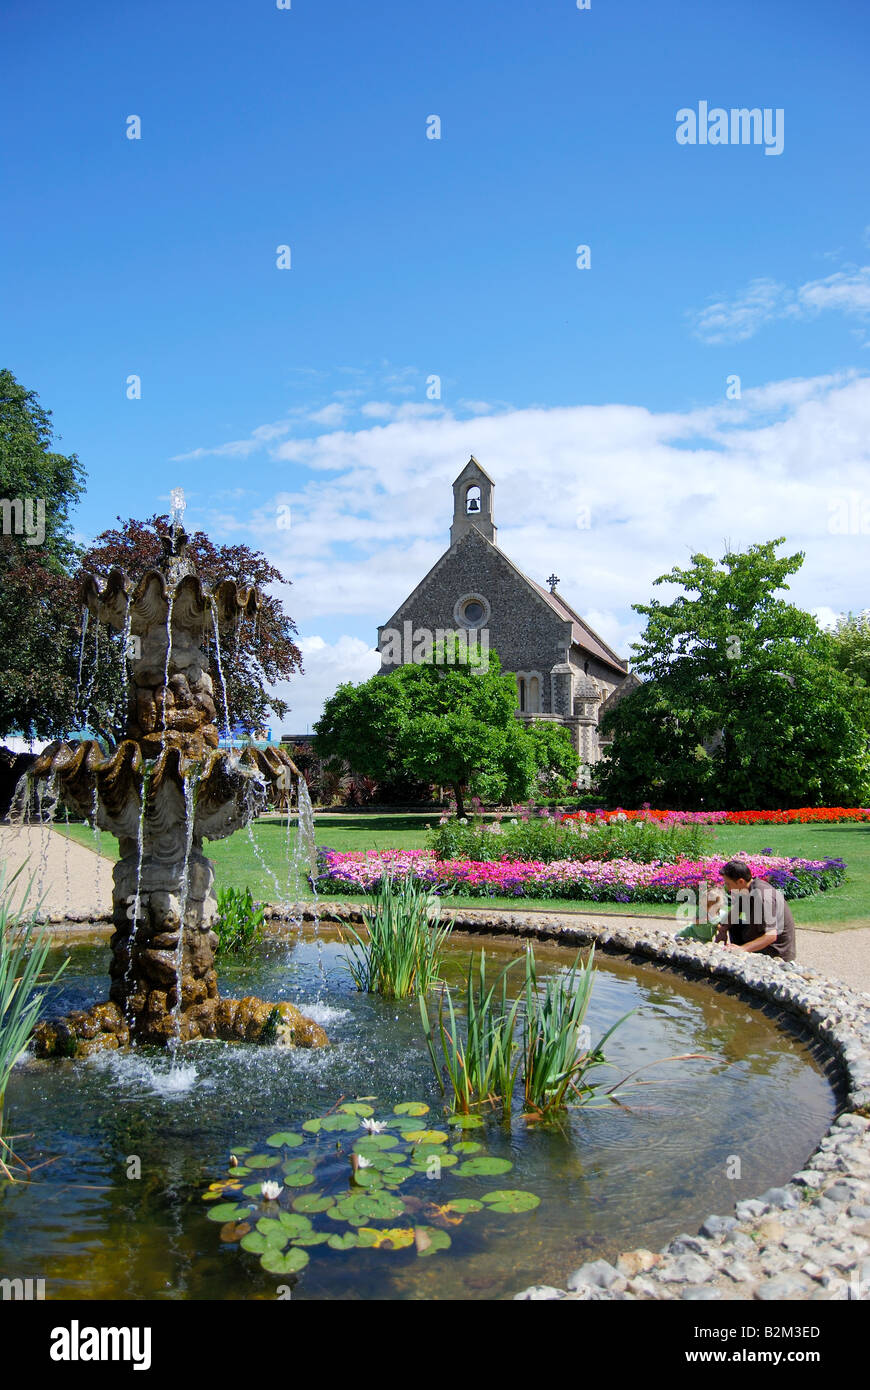 Fountain and pond, Forbury Gardens, Reading, Berkshire, England, United Kingdom Stock Photo